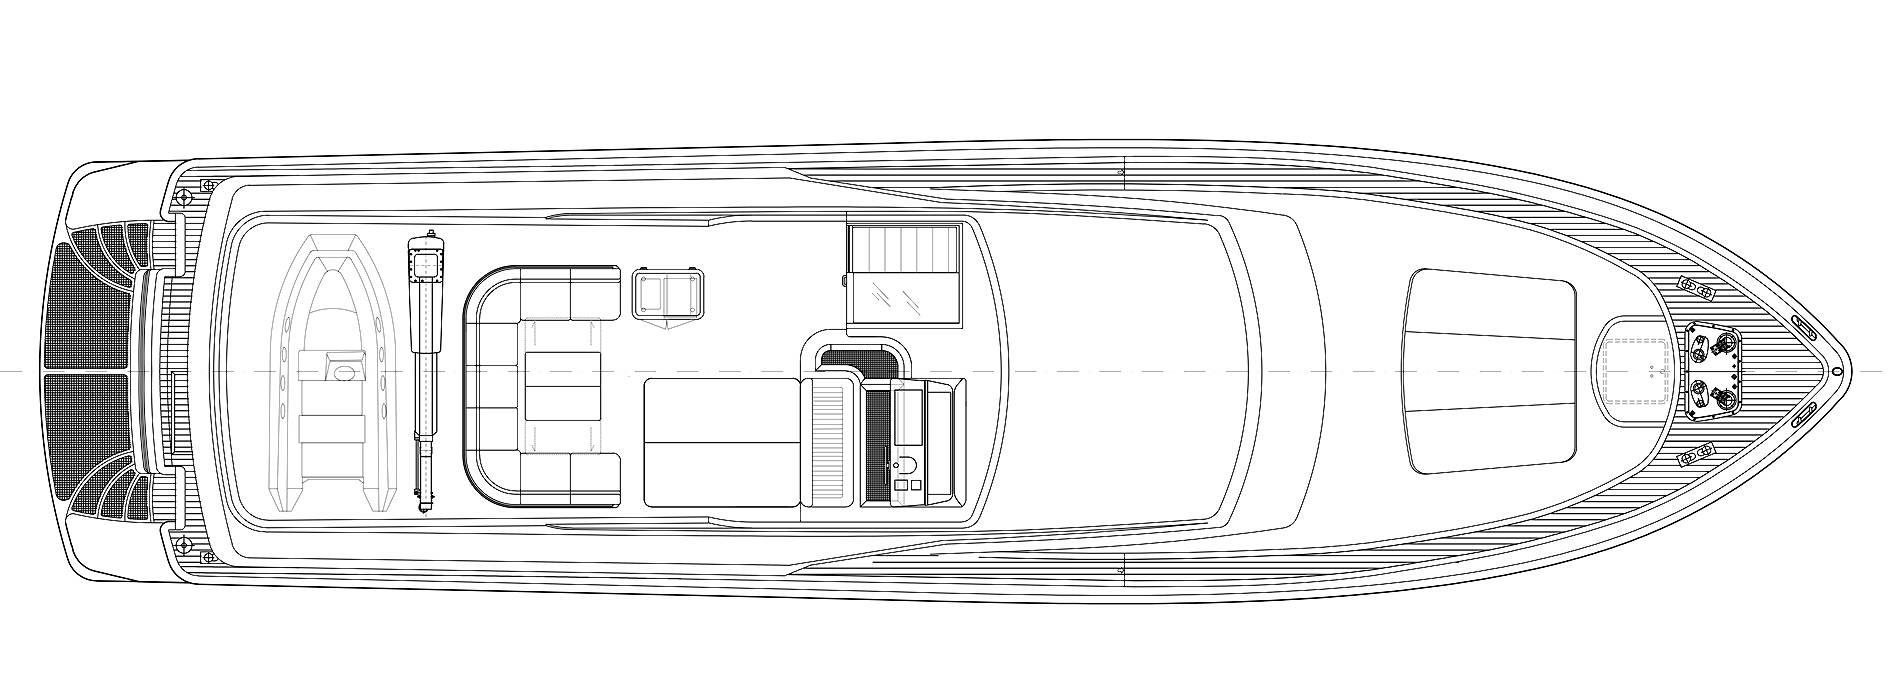 Sanlorenzo Yachts SL82-469 Mazuki Флайбридж